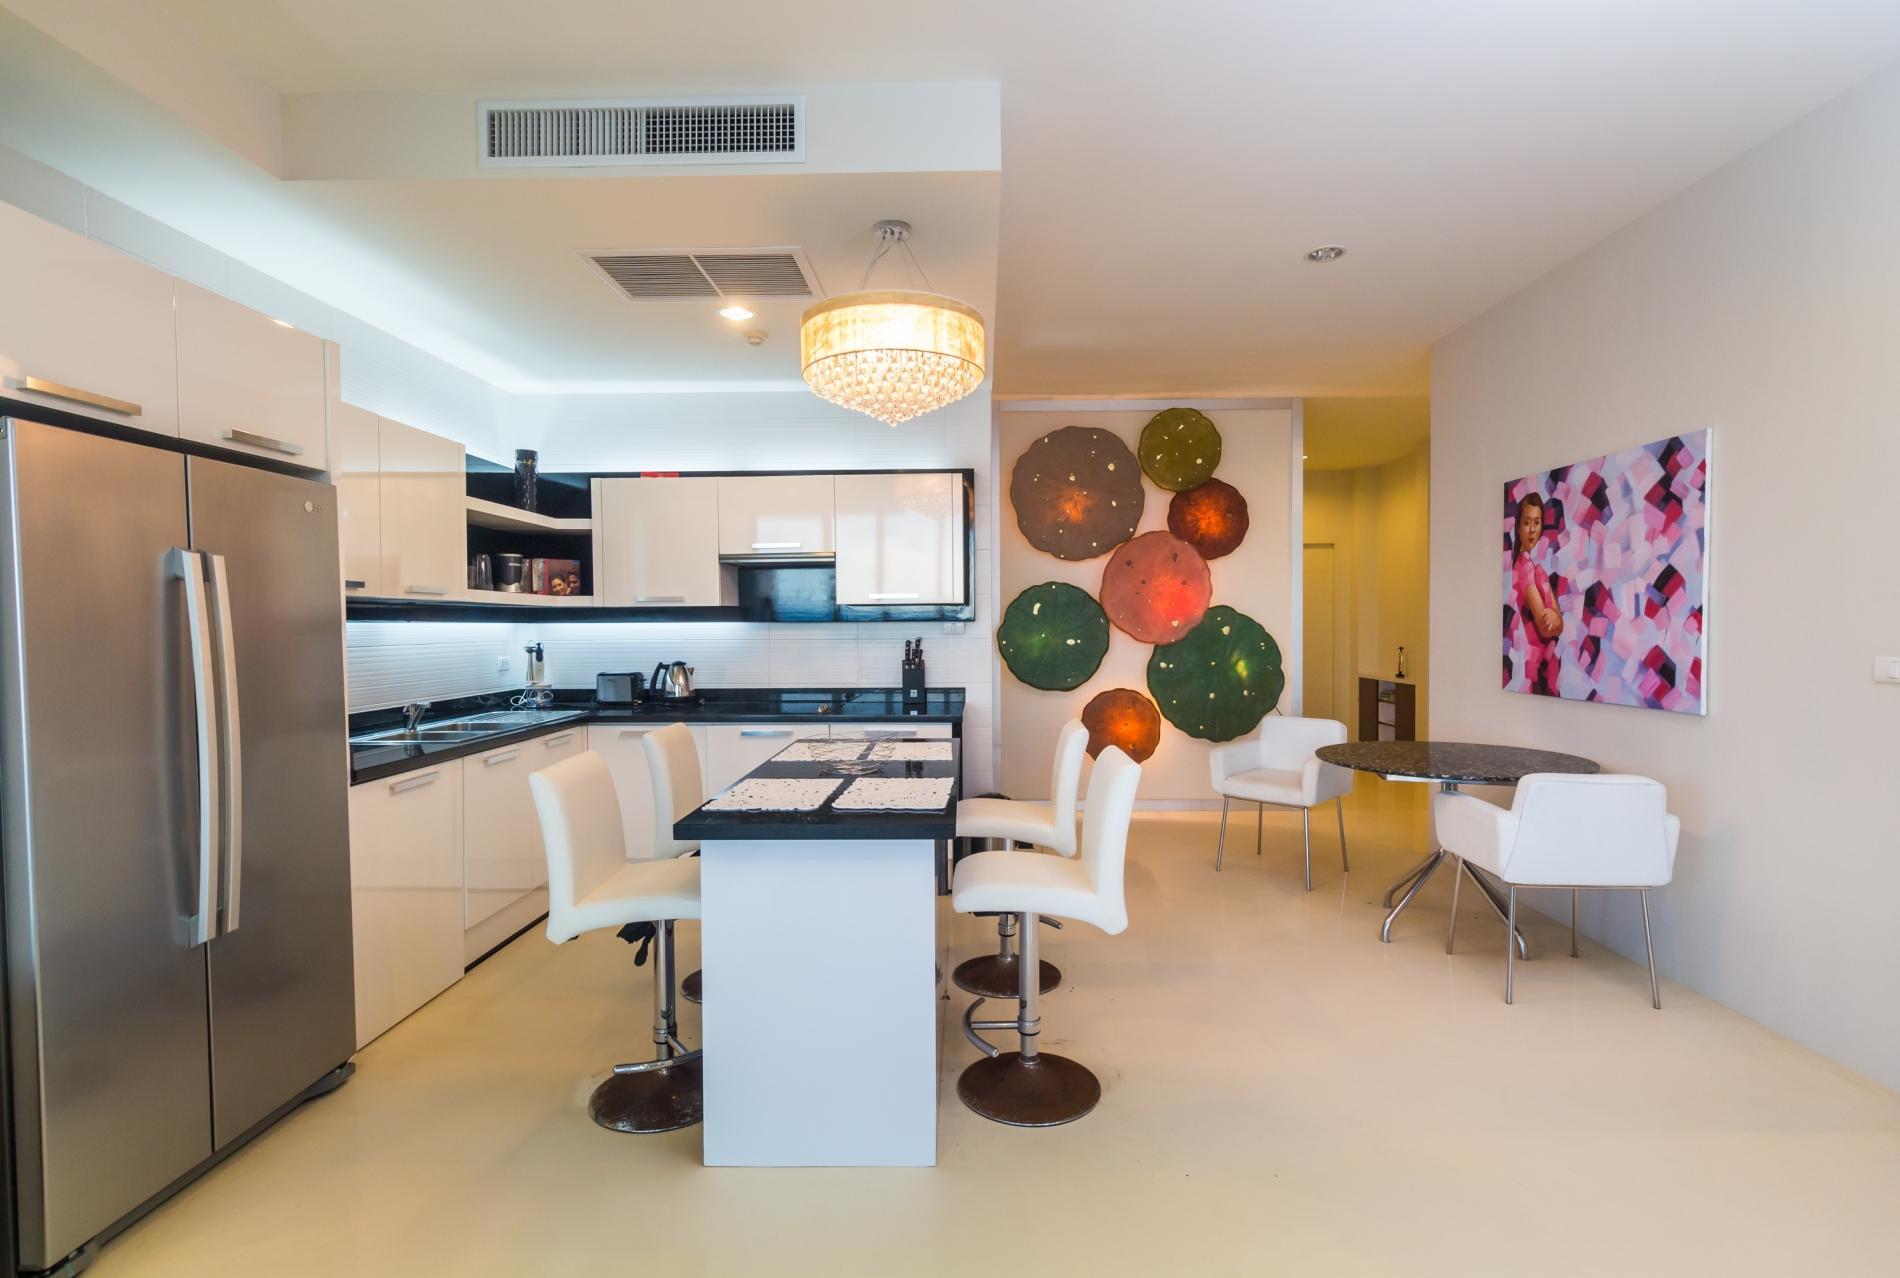 KH2605 - Sea-view Penthouse in Karon, walk to beach, restaurants, bars, shops photo 20179425